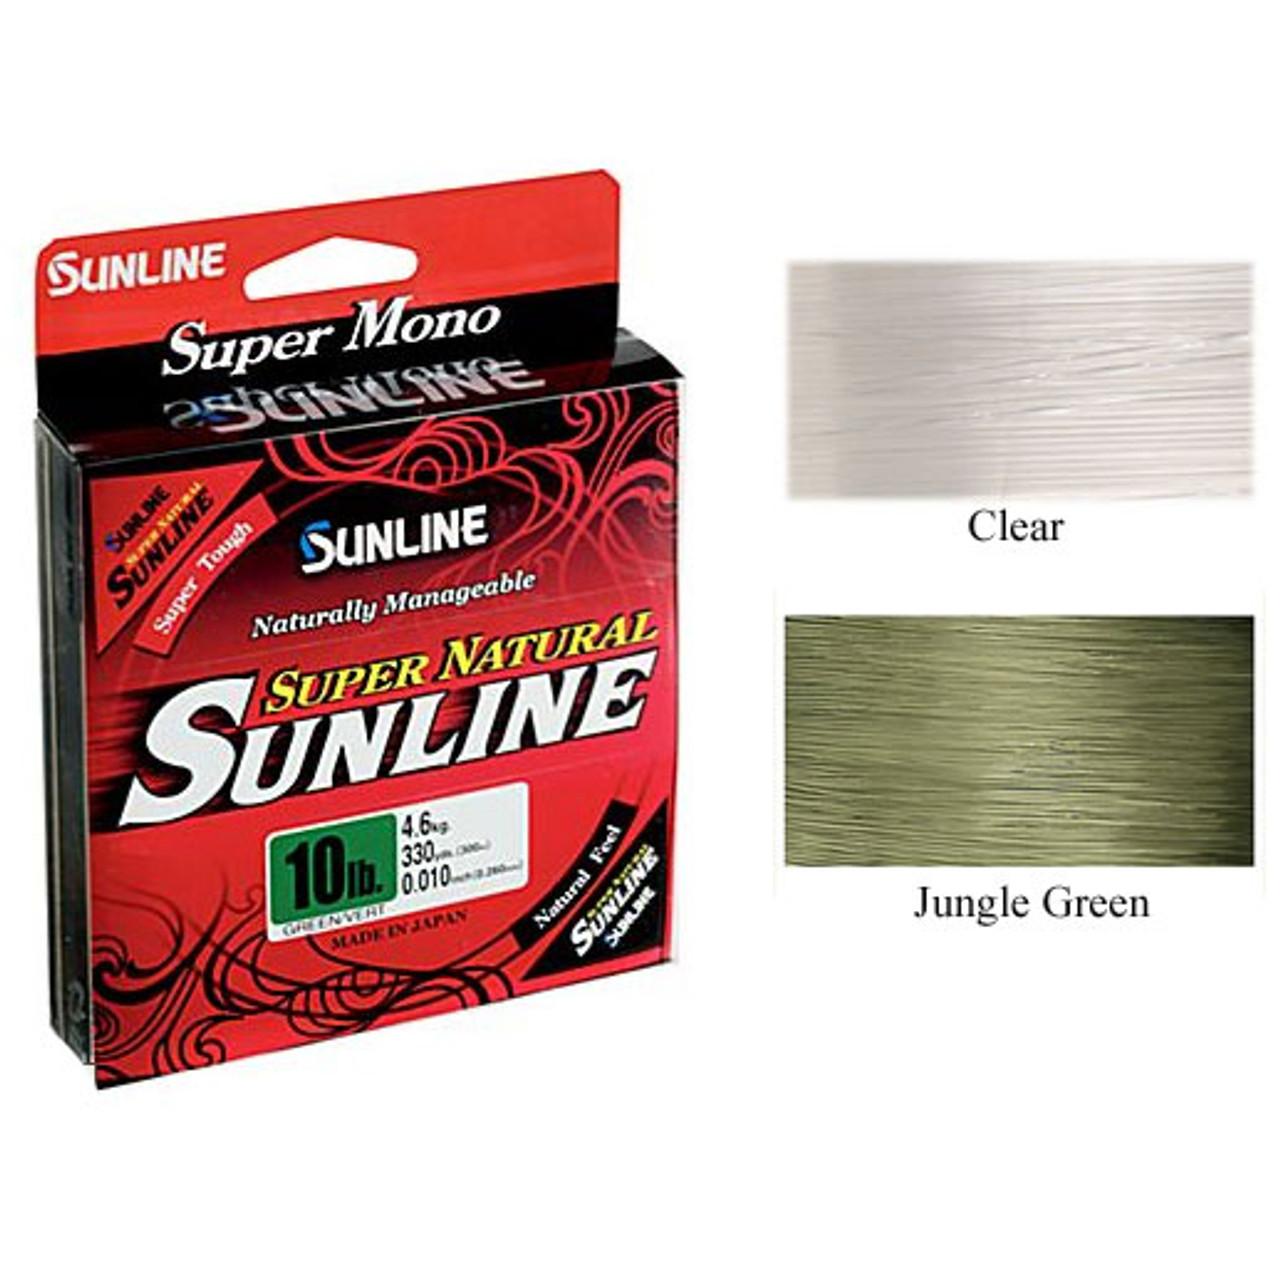 330 yd Sunline Super Natural Monofilament 16 lb Clear Line